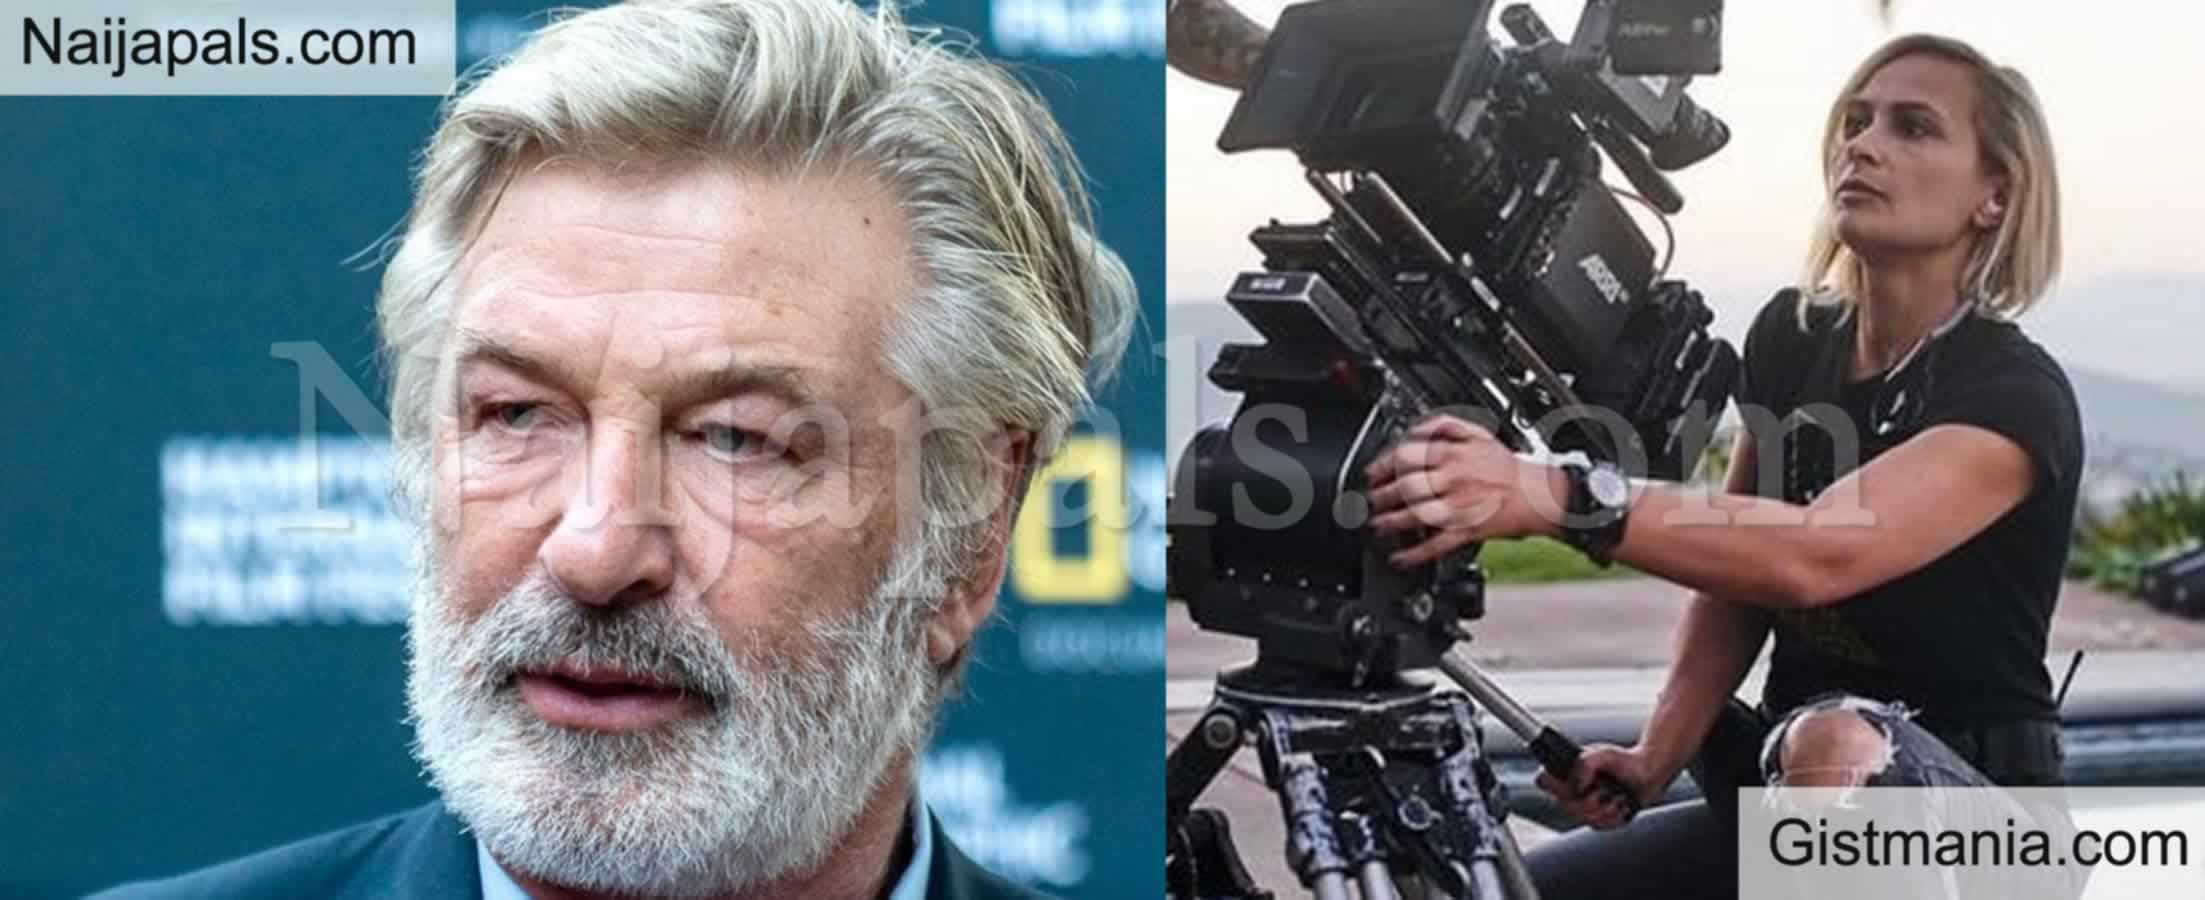 <img alt='.' class='lazyload' data-src='https://img.gistmania.com/emot/shocked.gif' /> American Actor<b>, Alec Baldwin Accidentally Kills Cinematographer With Prop Gun On Set</b>